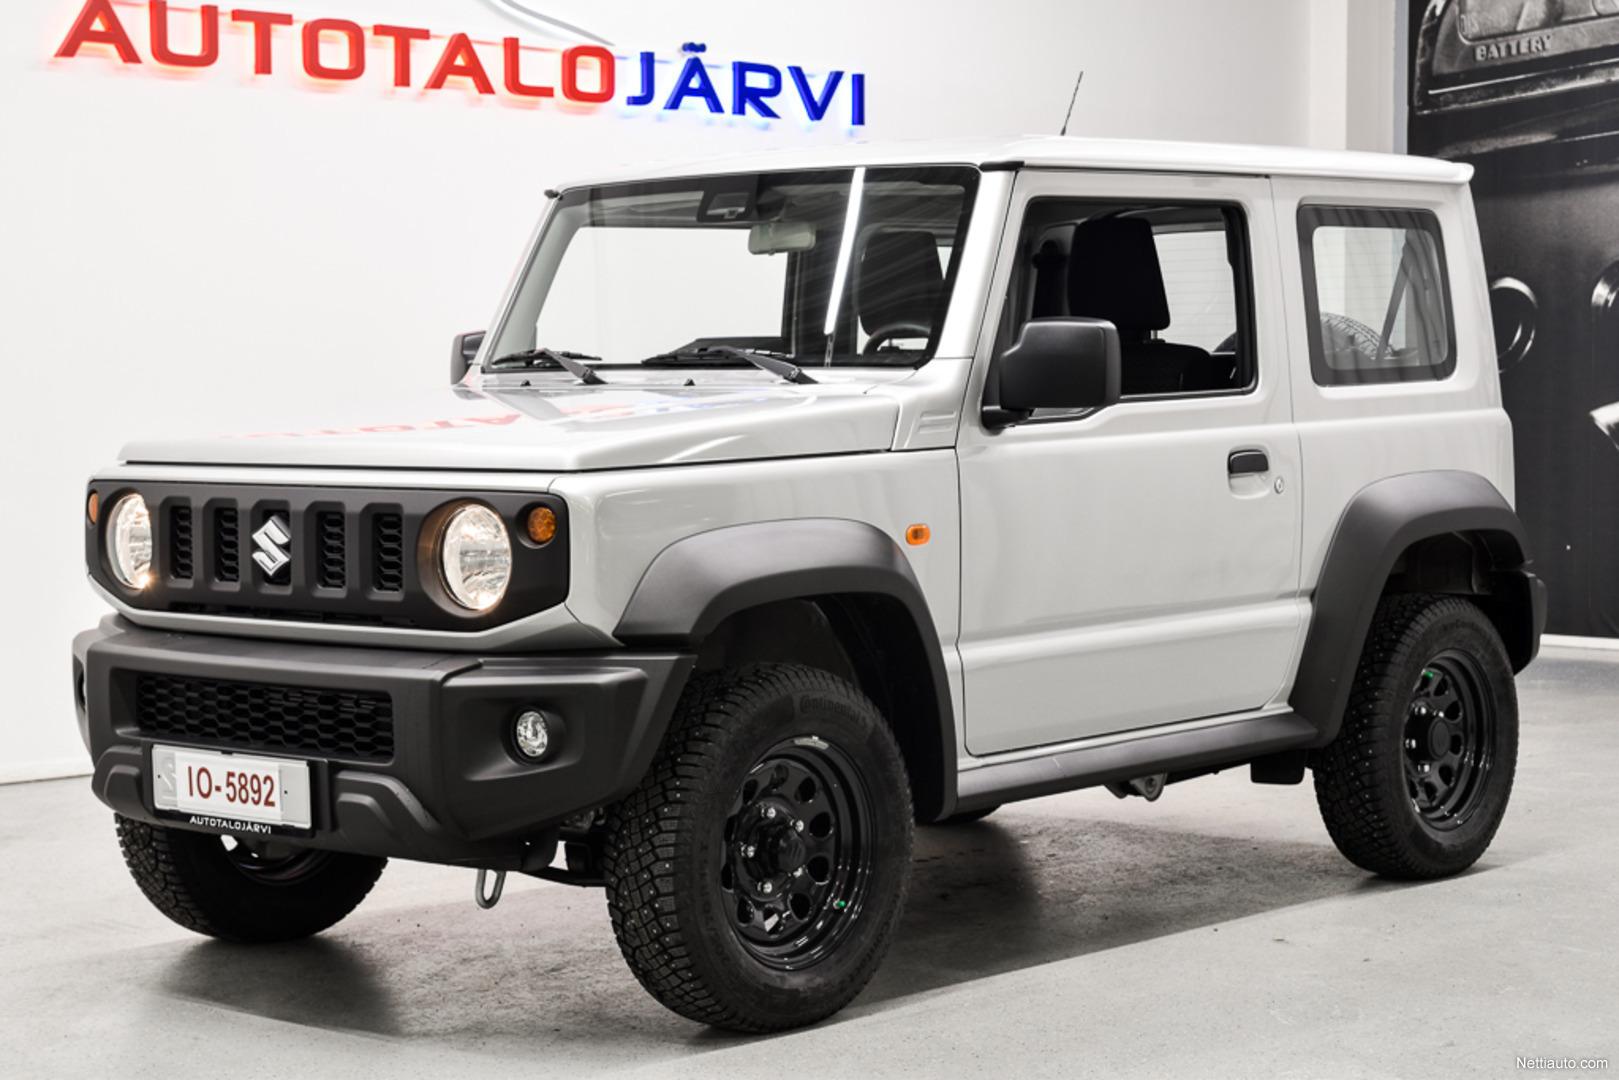 Uusi Suzuki Jimny